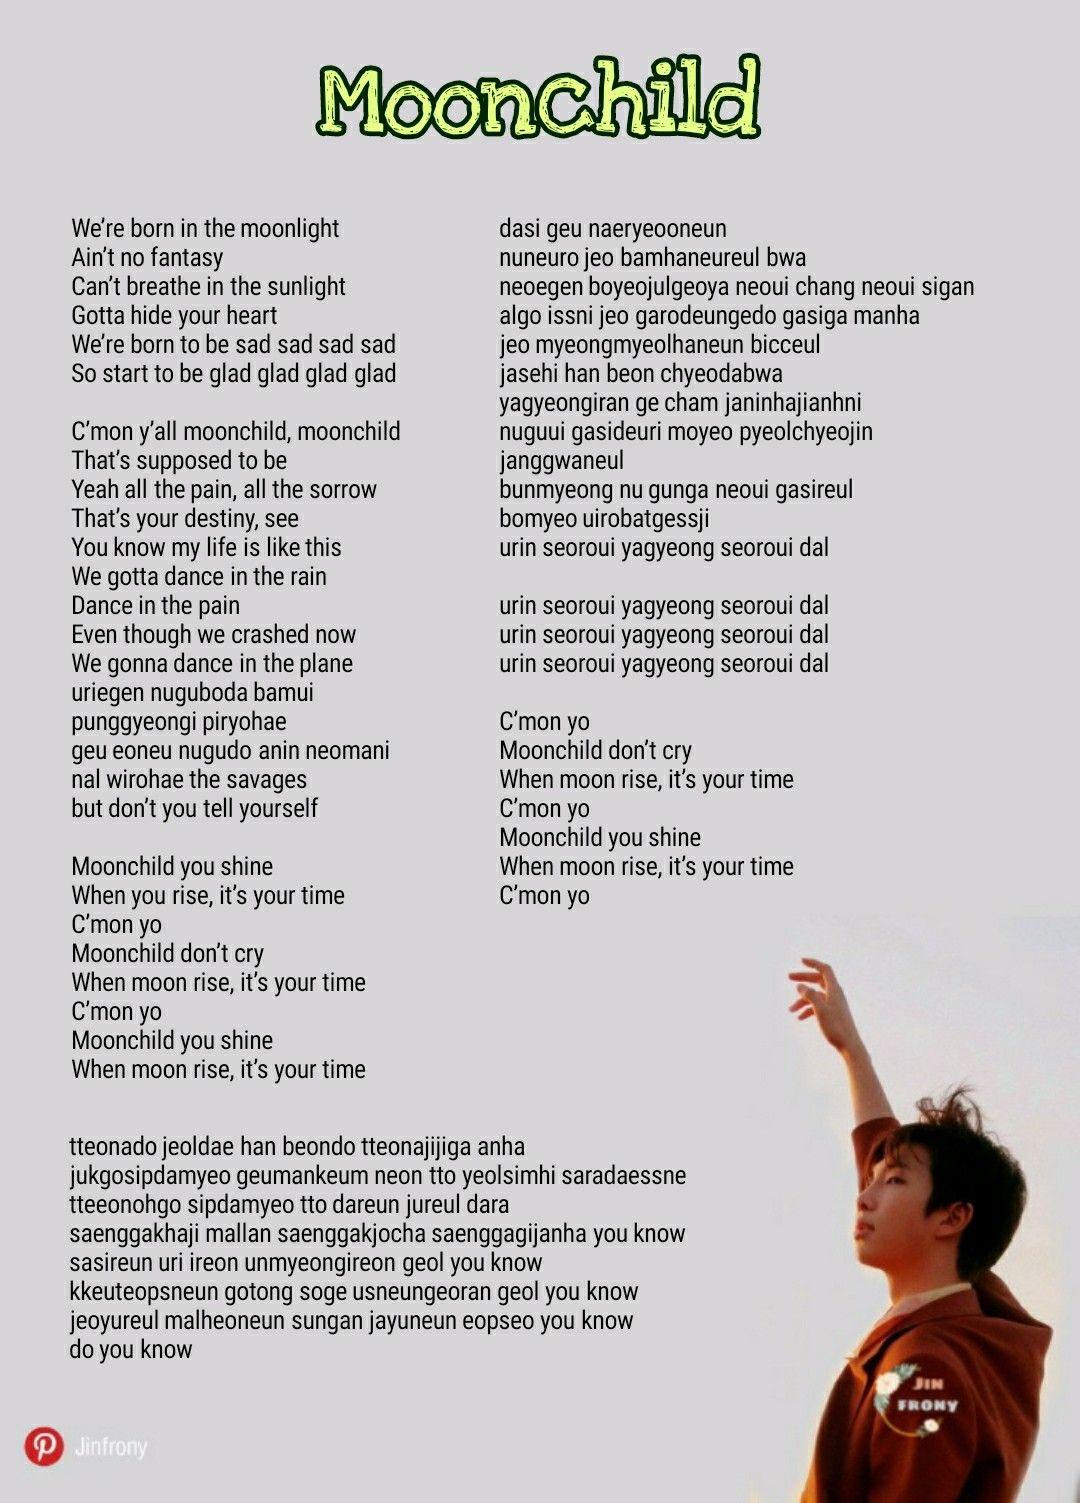 Lirik Lagu Let Go Bts : lirik, Moonchild, Lyrics, Kutipan, Lirik,, Lirik, Lagu,